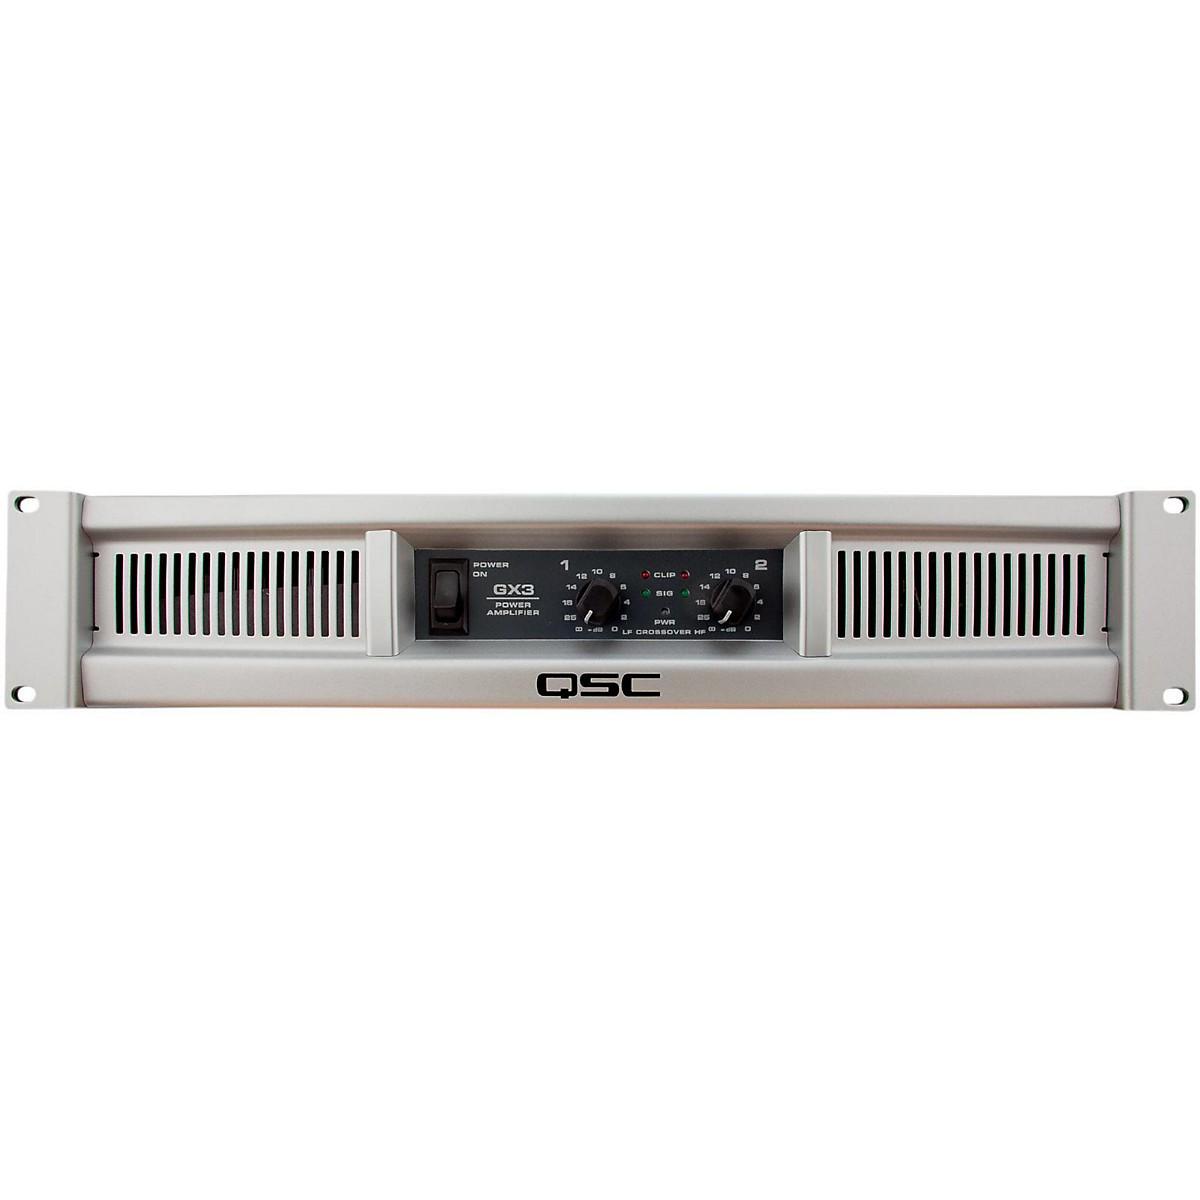 QSC GX3 Stereo Power Amplifier